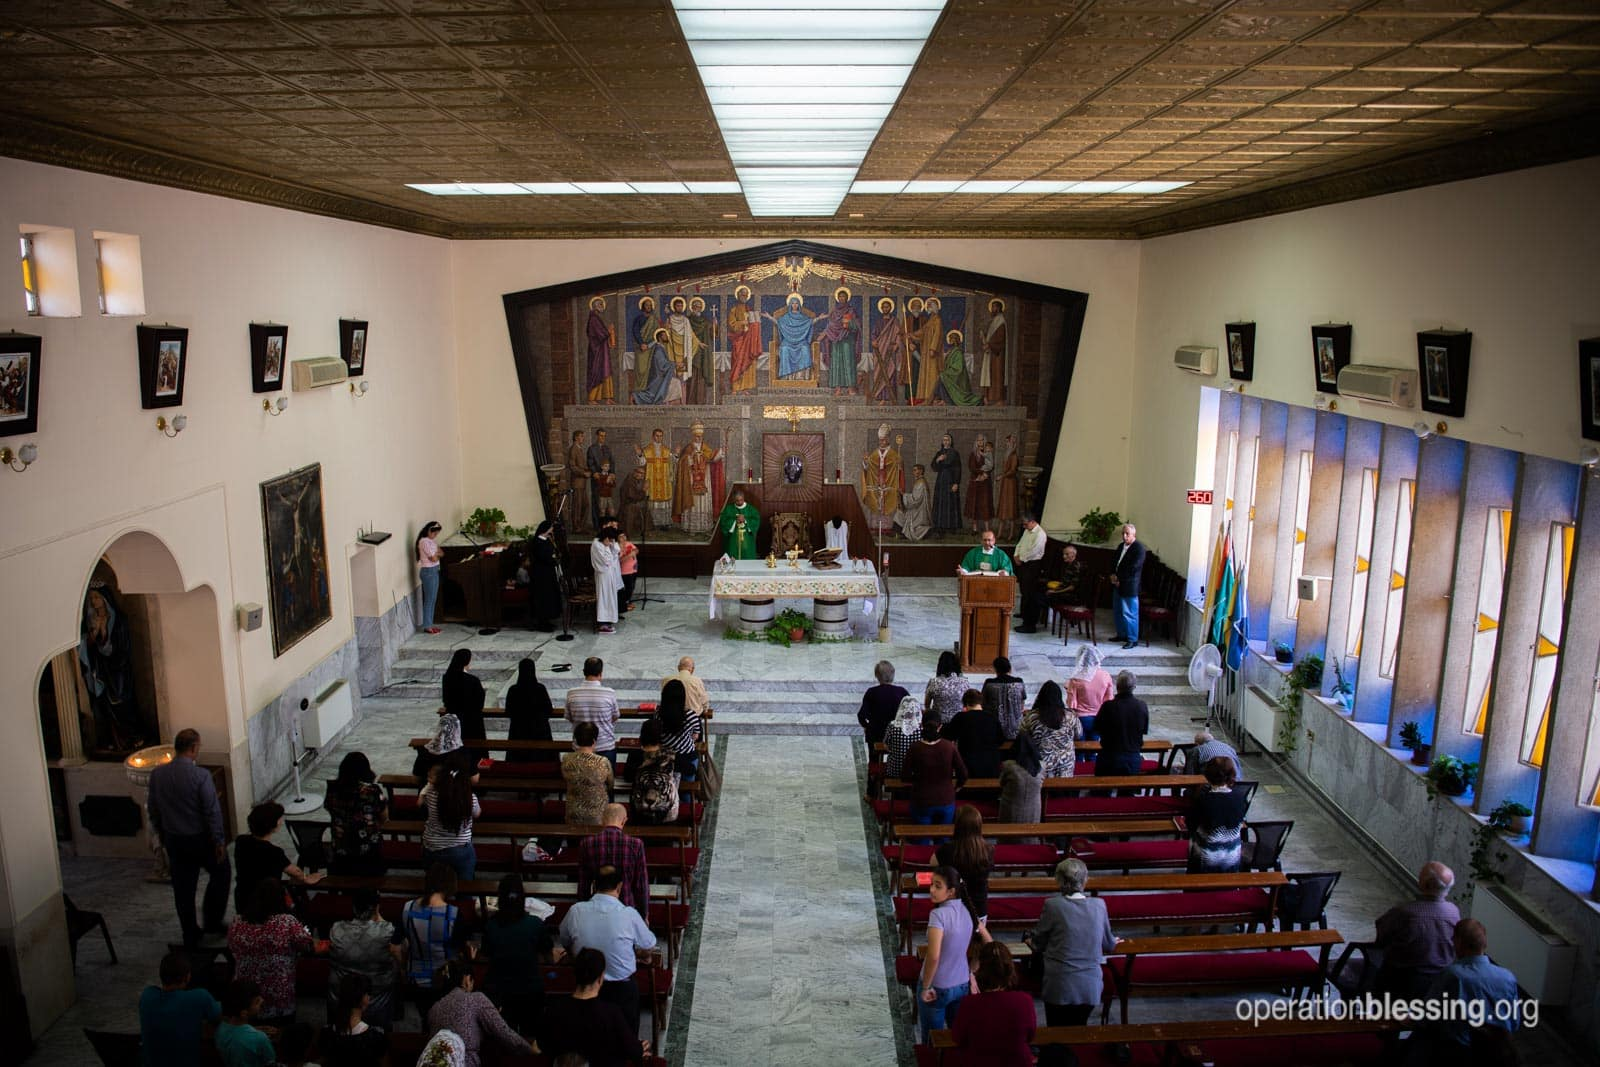 A Christian church in Jordan.